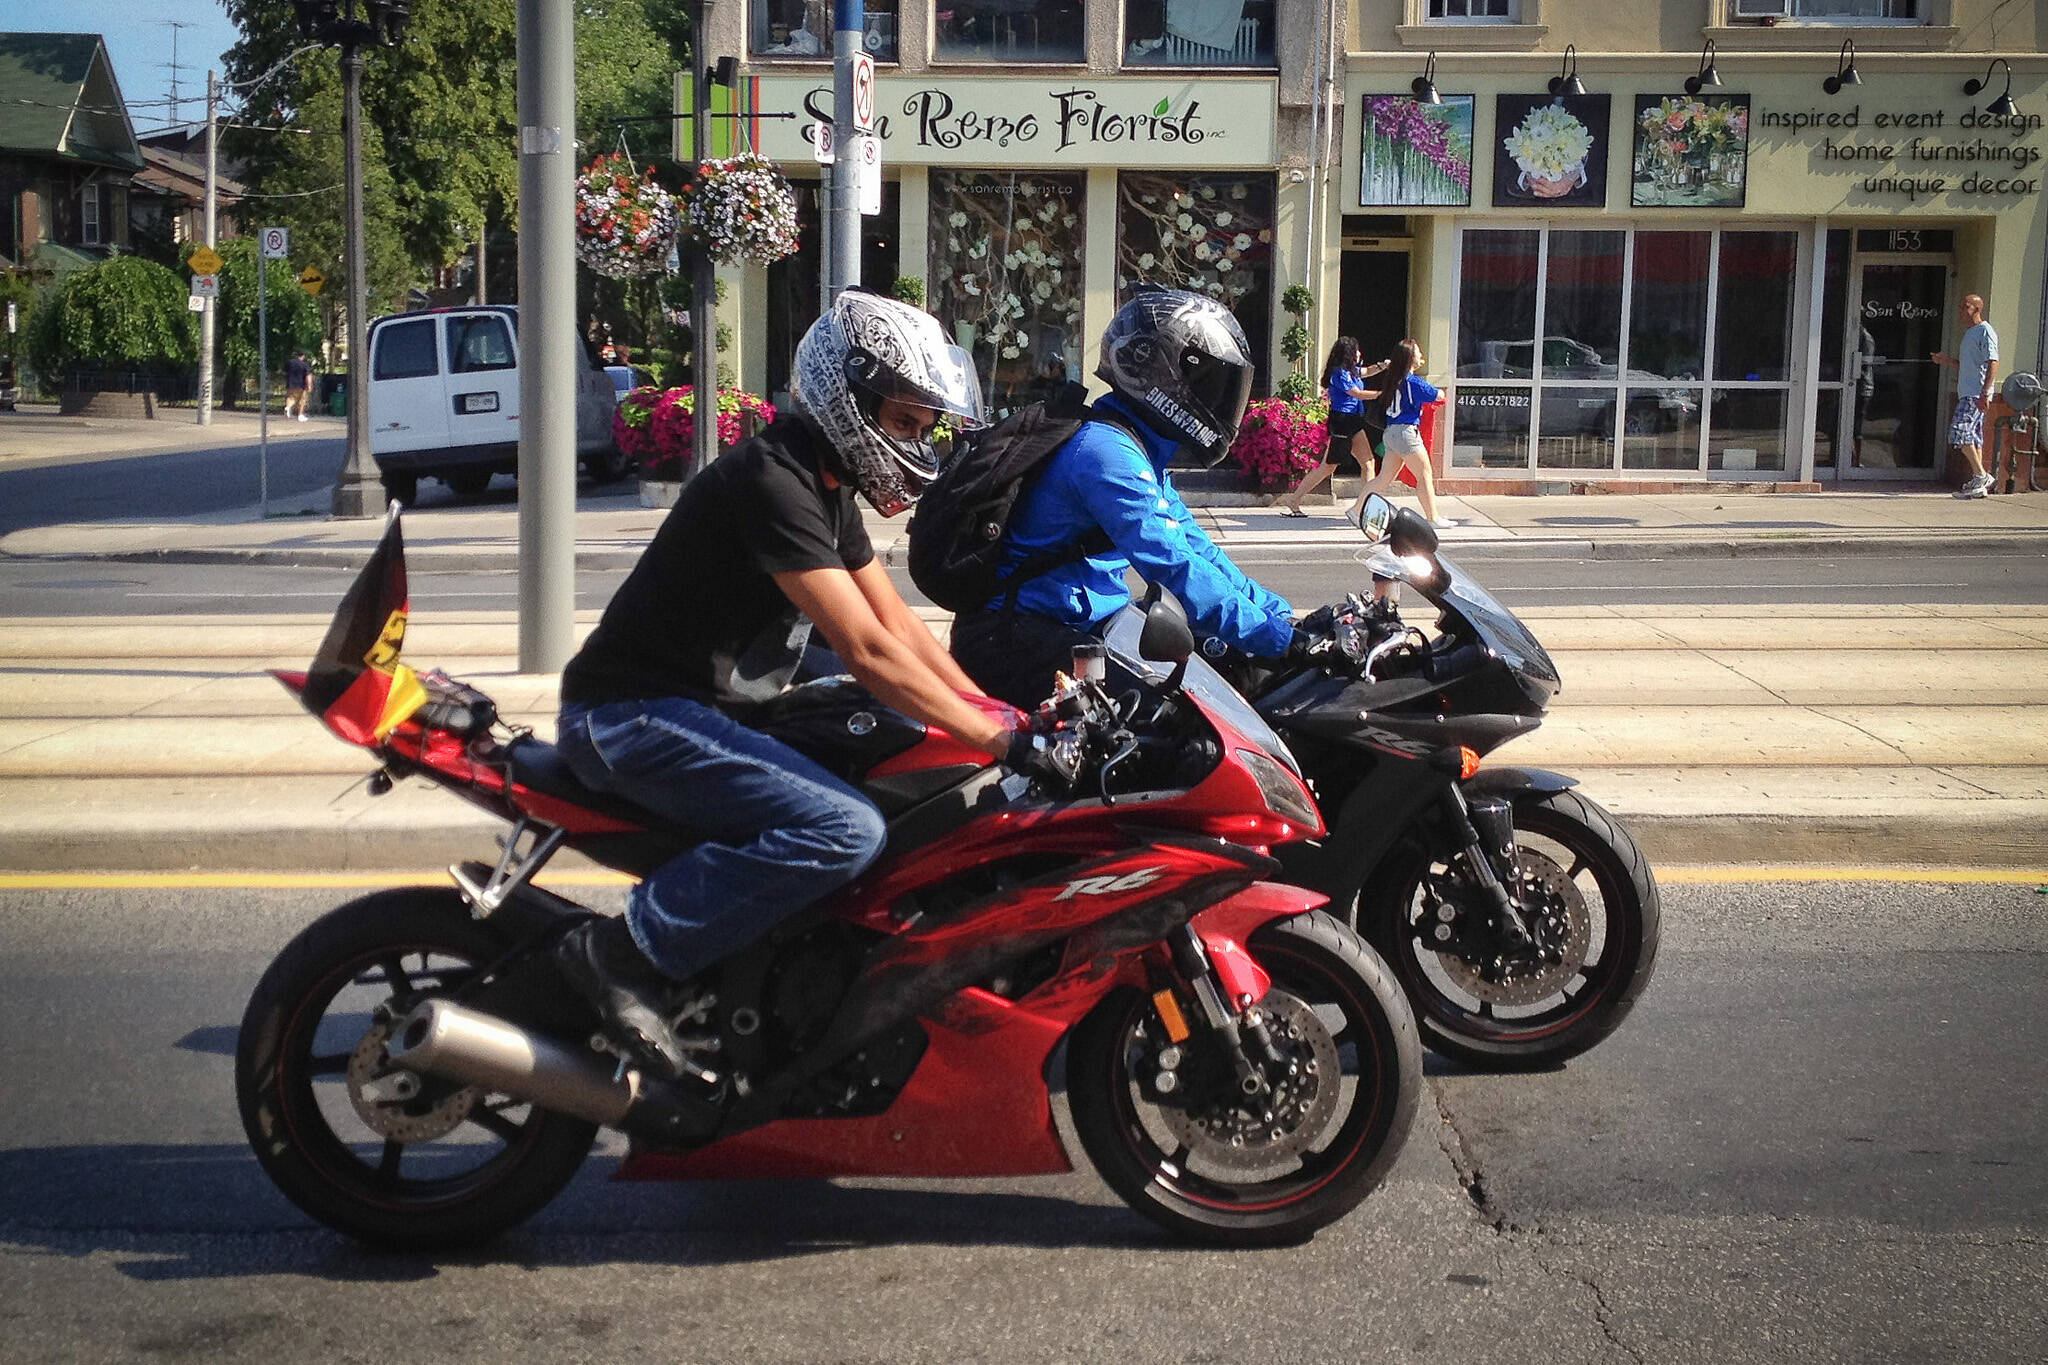 motorcycle noise toronto